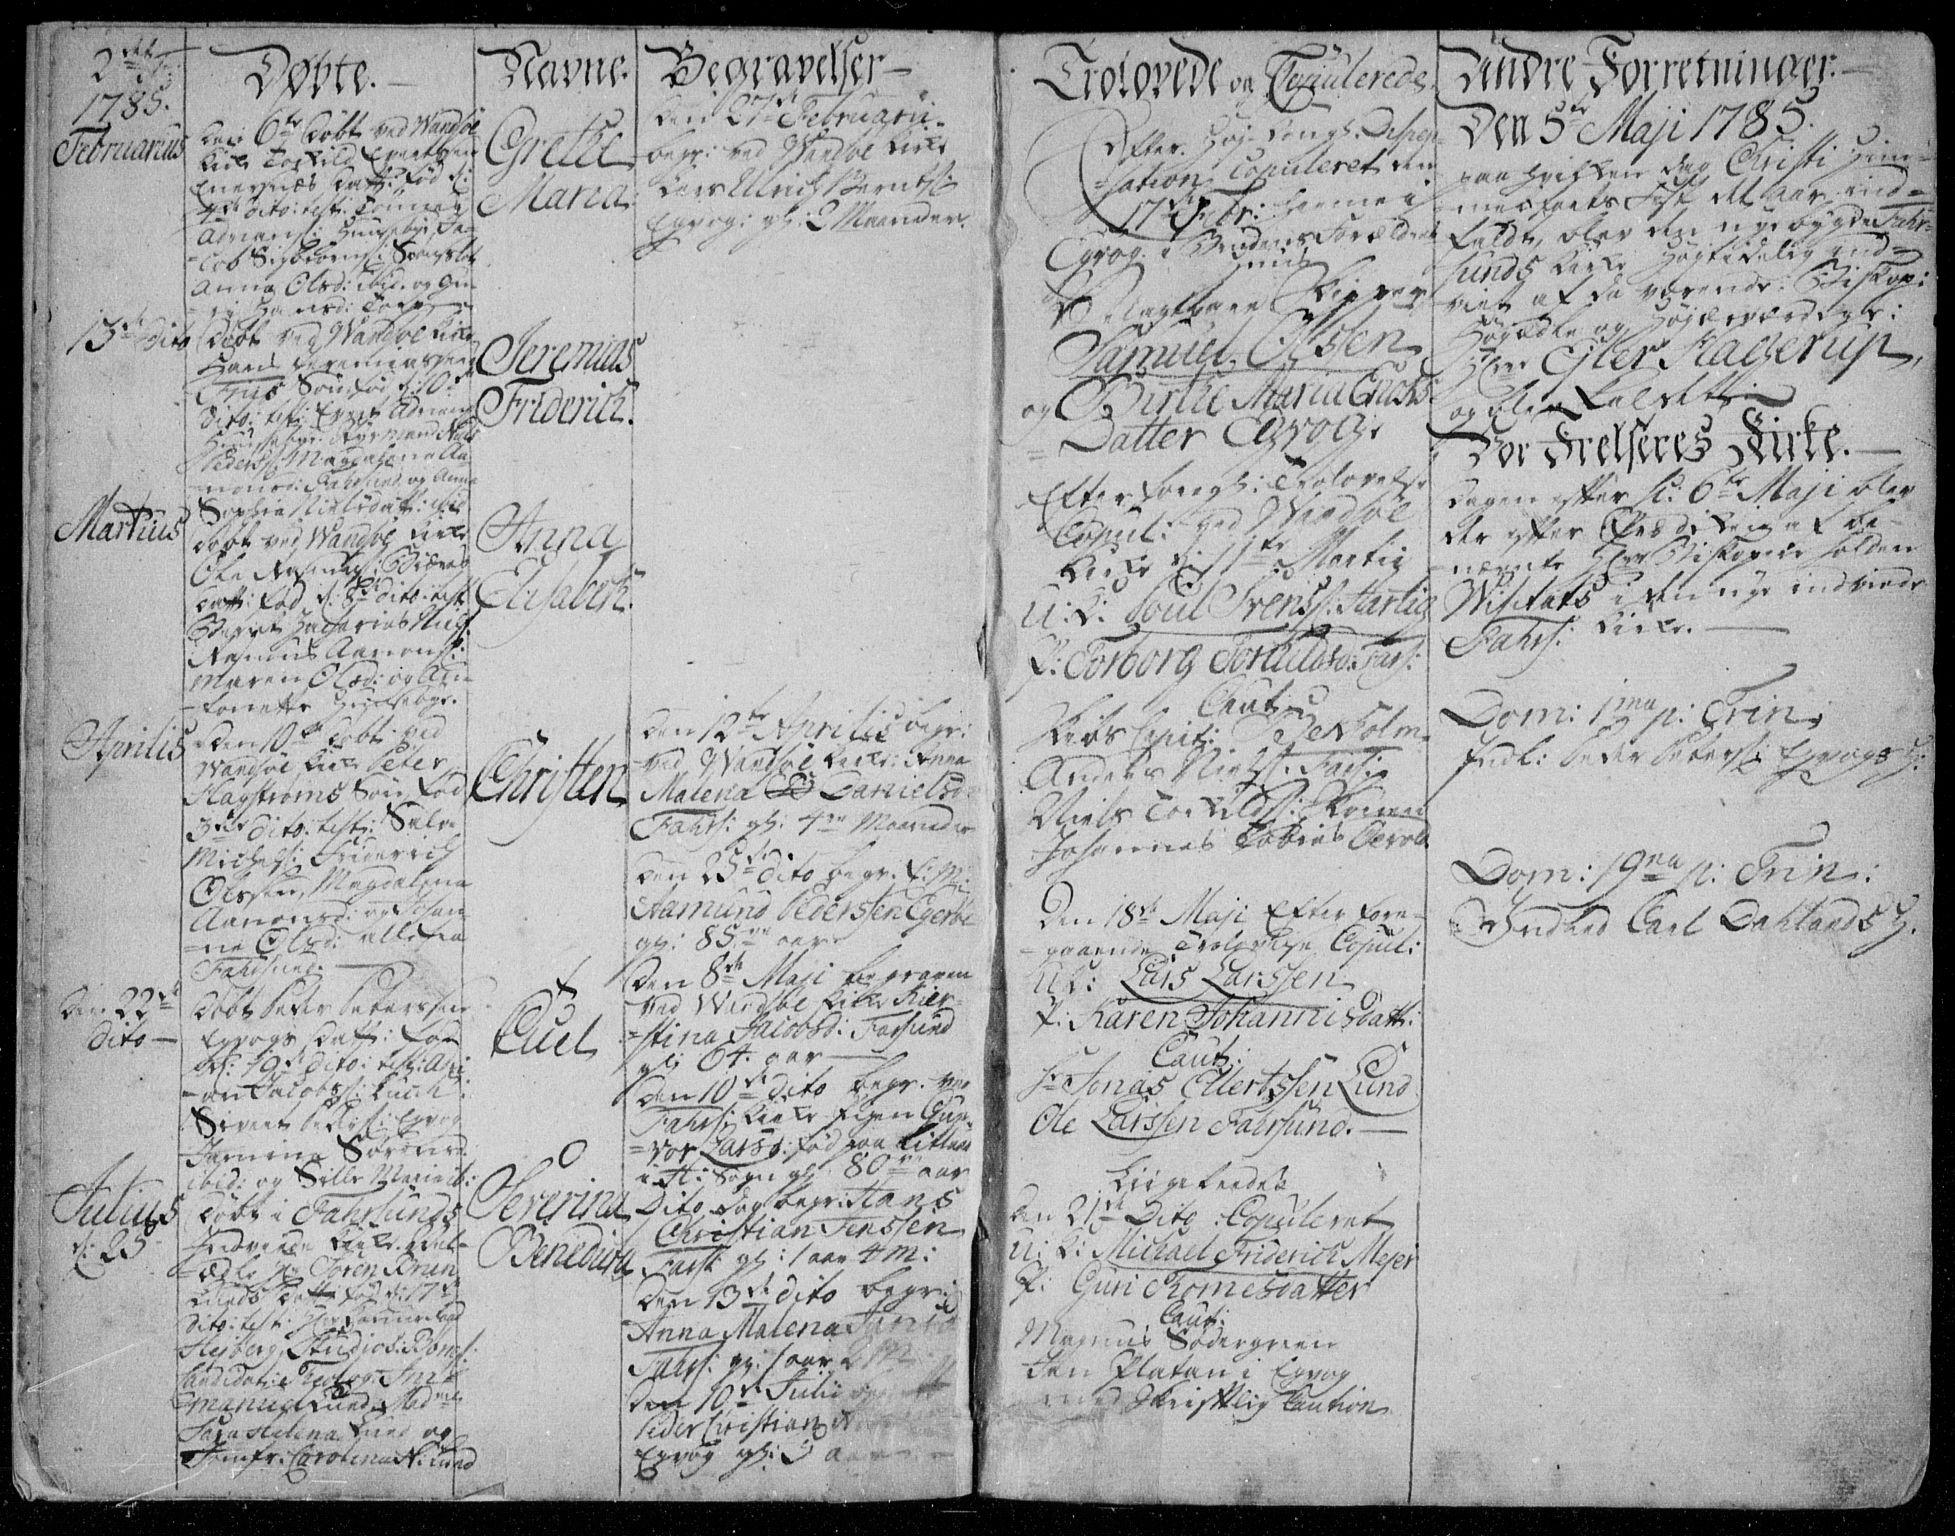 SAK, Farsund sokneprestkontor, F/Fa/L0001: Ministerialbok nr. A 1, 1784-1815, s. 3